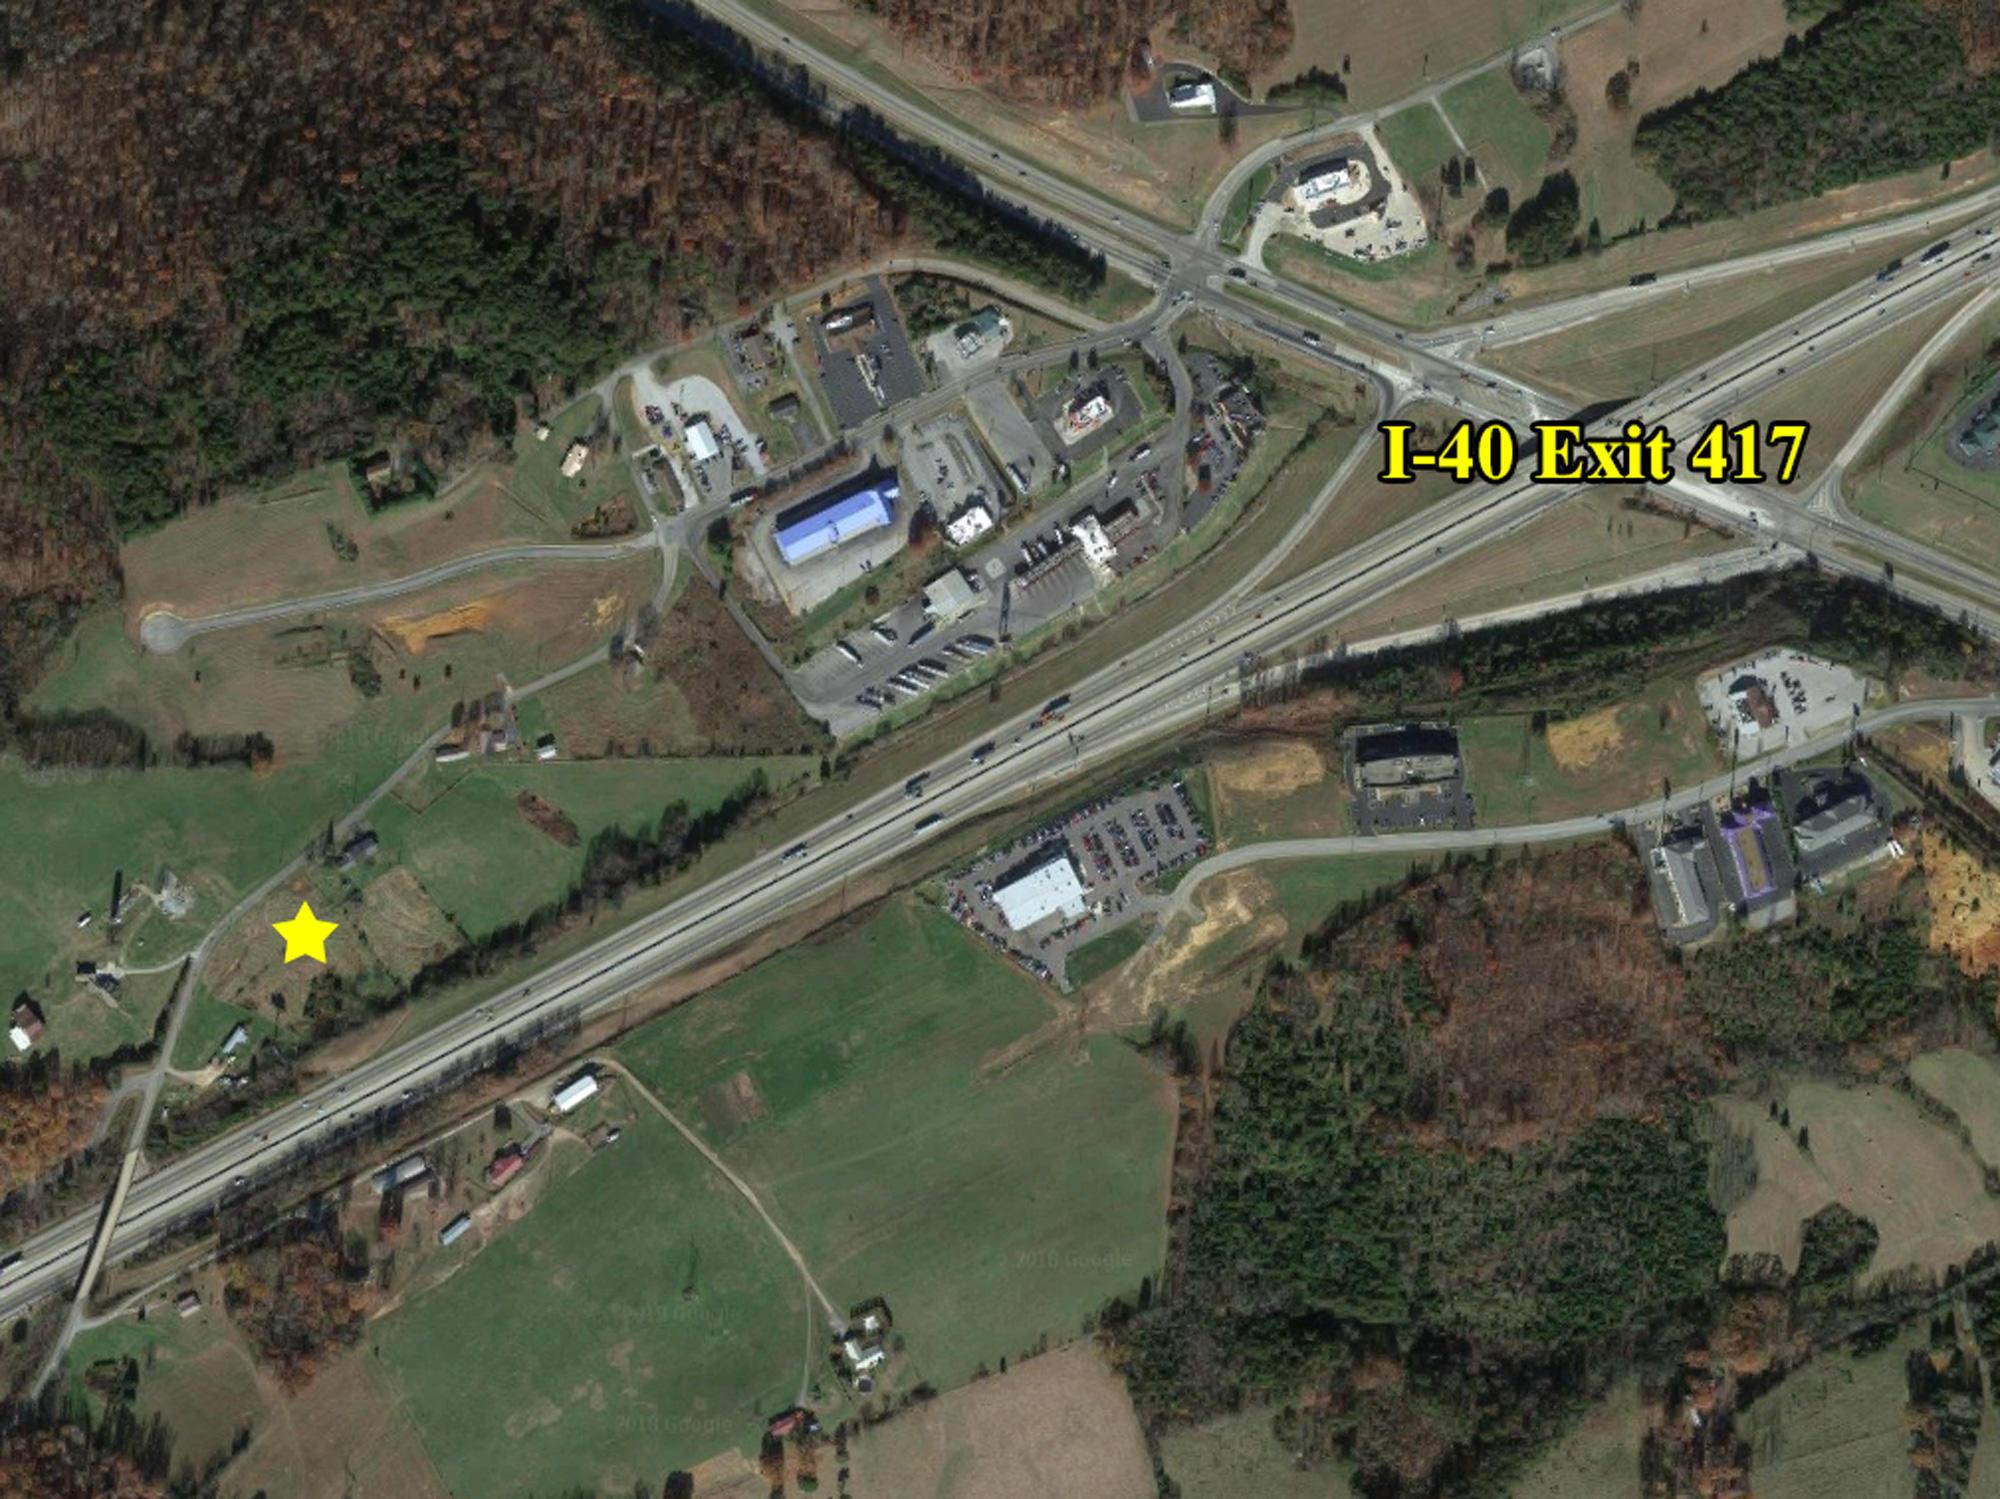 310 Goose Creek Rd, Dandridge, TN 37725 (MLS# 1036459